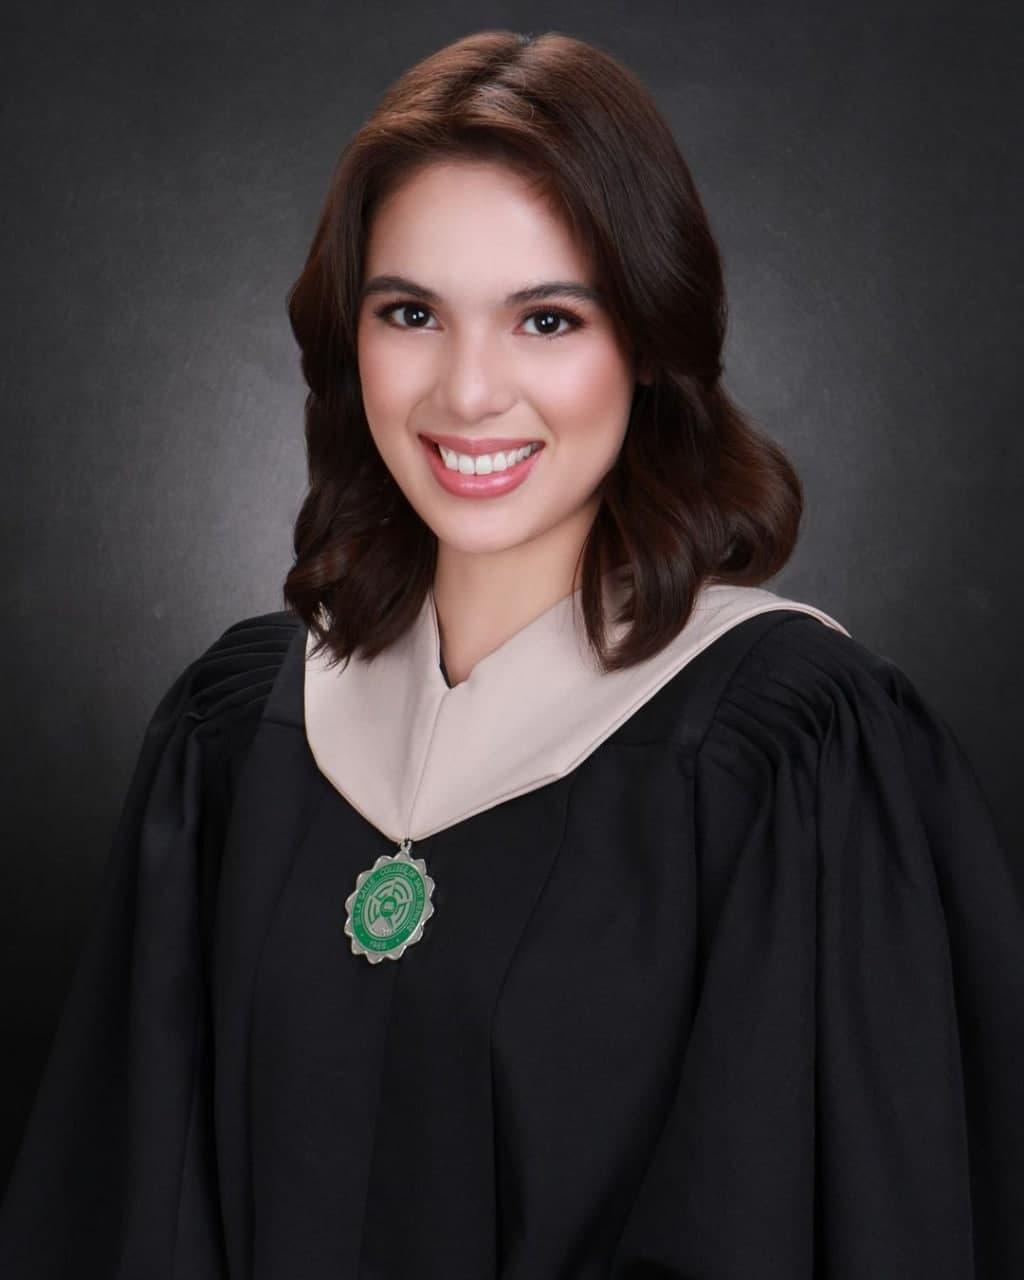 Michelle Vito's graduation photo as she graduates from DLS-CSB